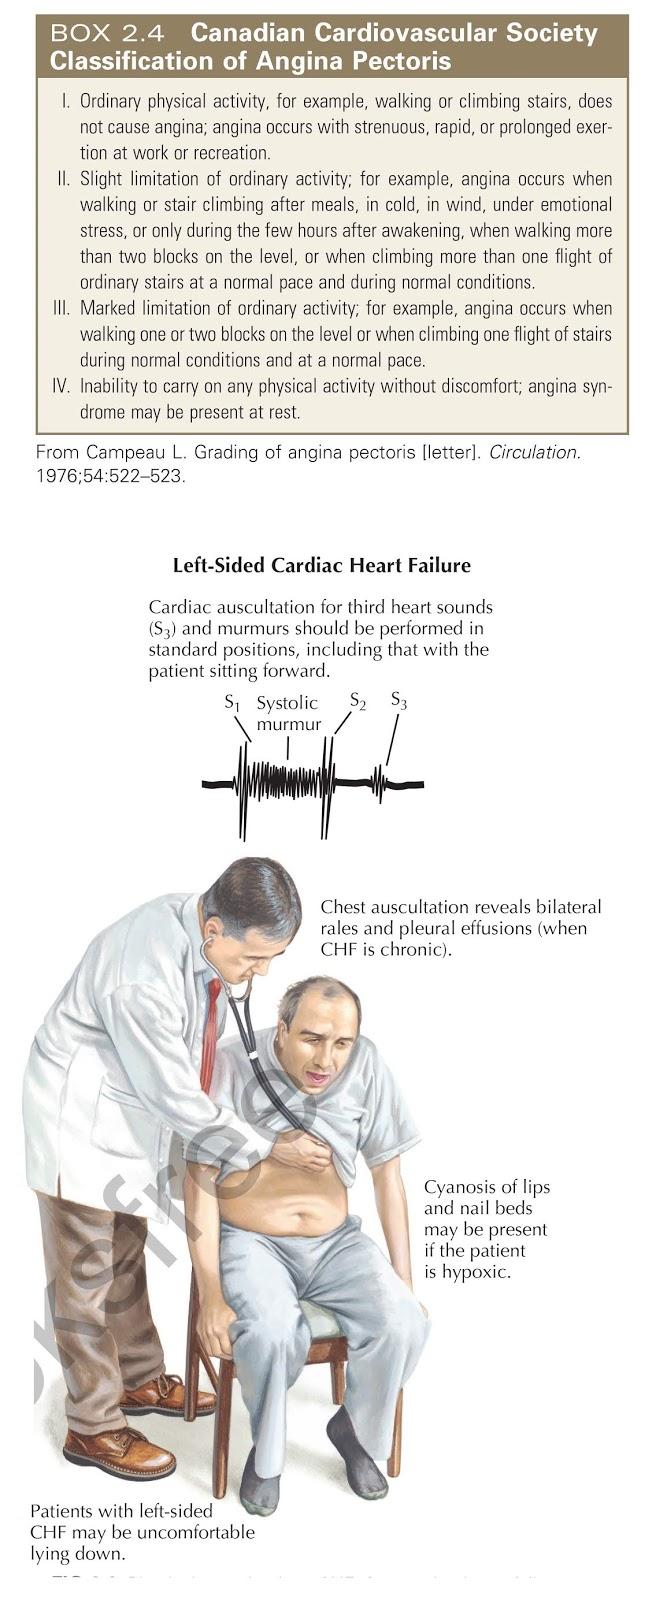 Physical examination. CHF, Congestive heart failure.